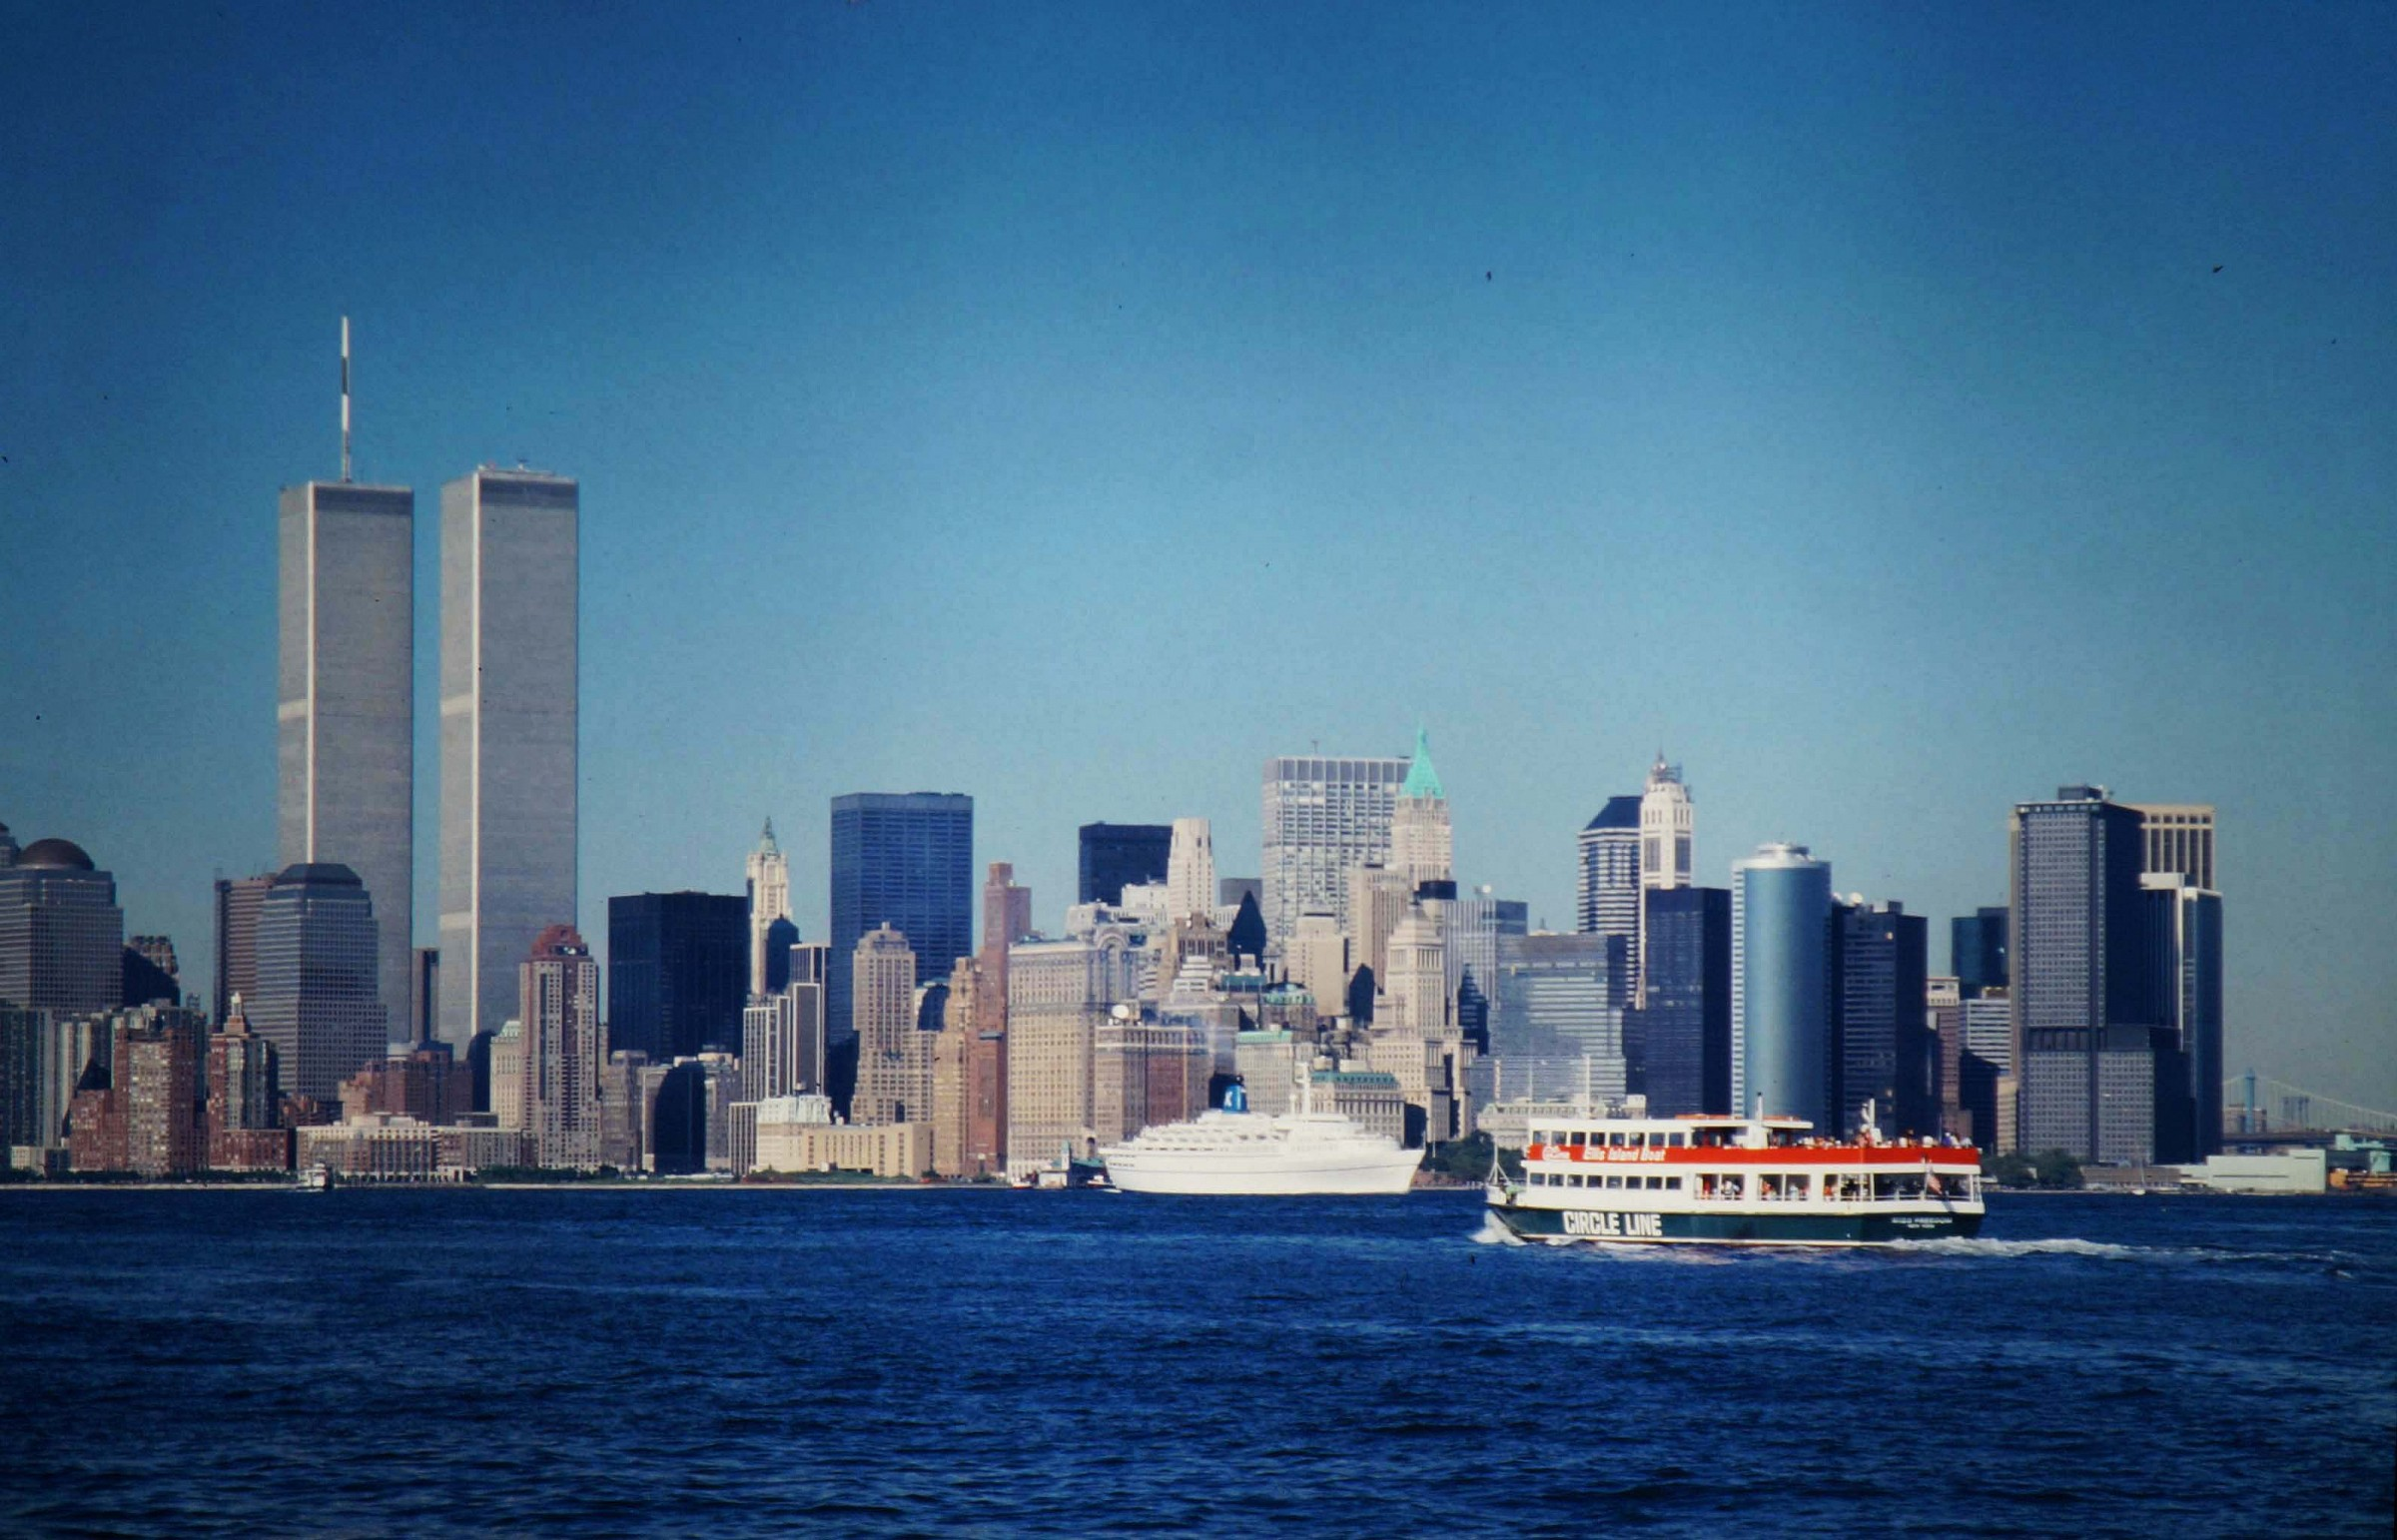 World Trade Center 2...